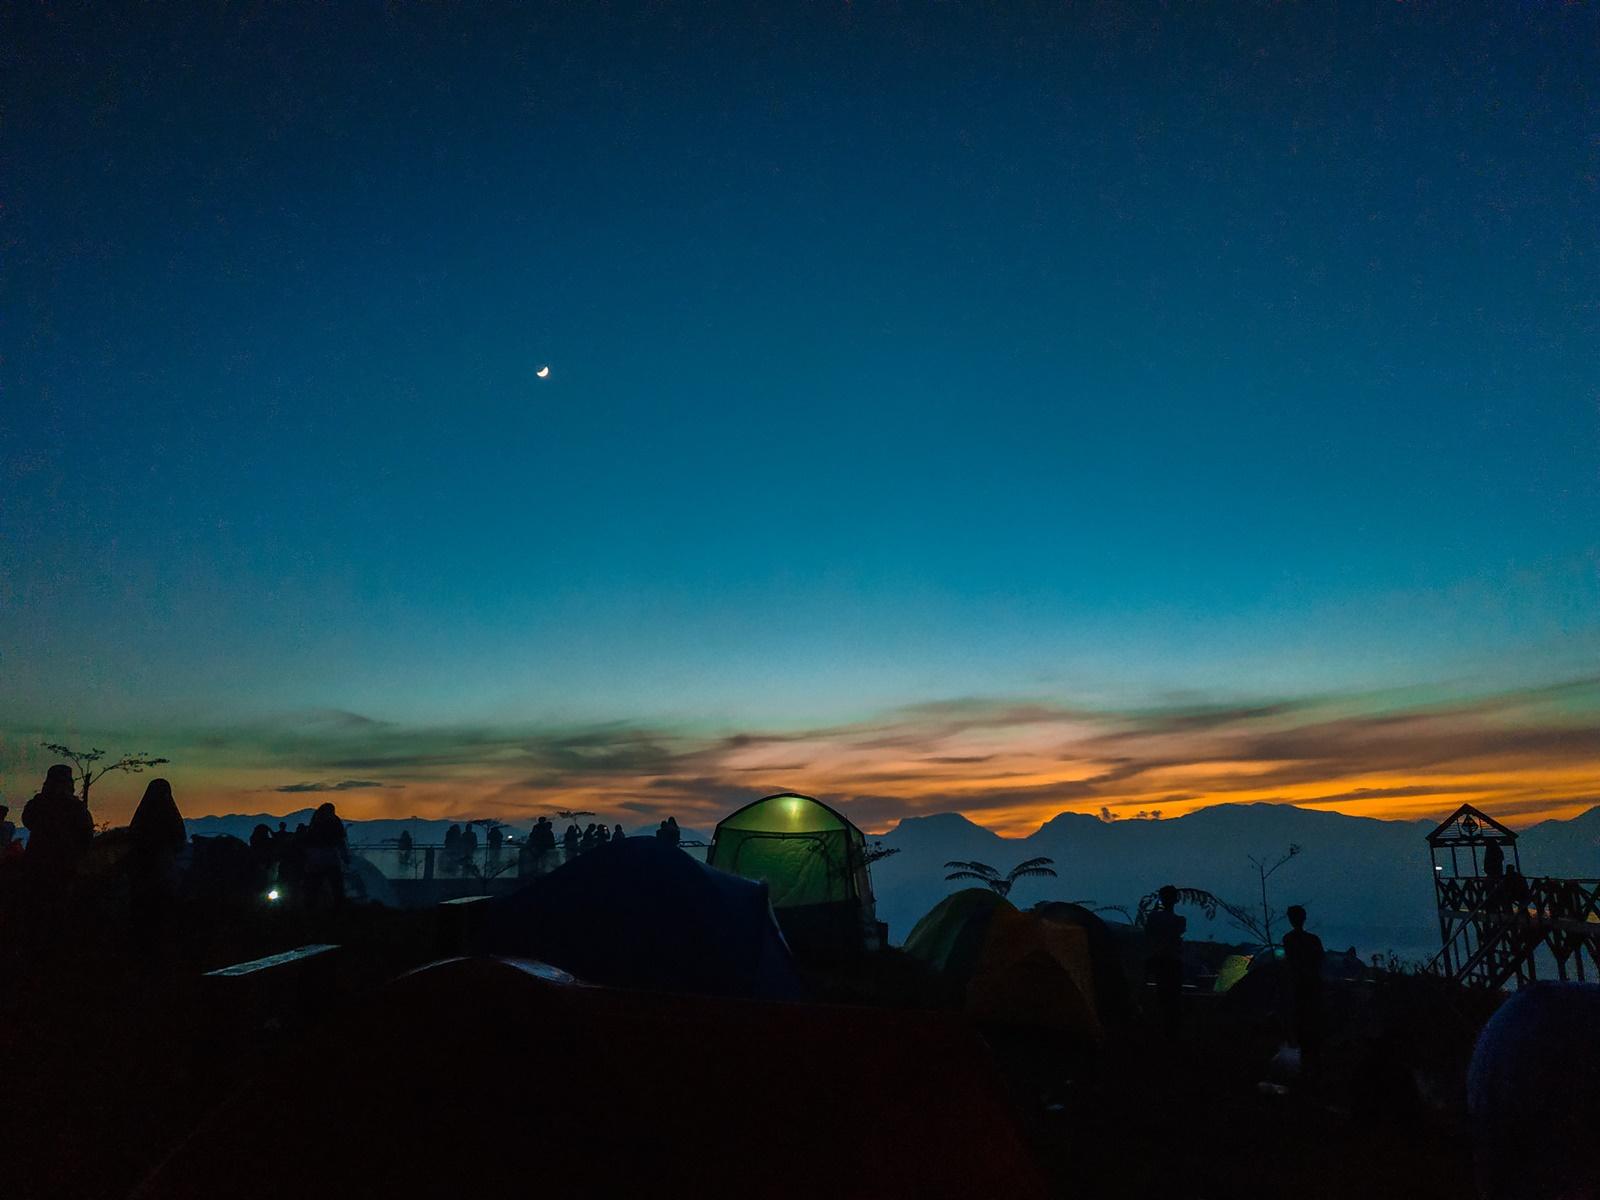 Langit malam di Taman langit Pangalengan